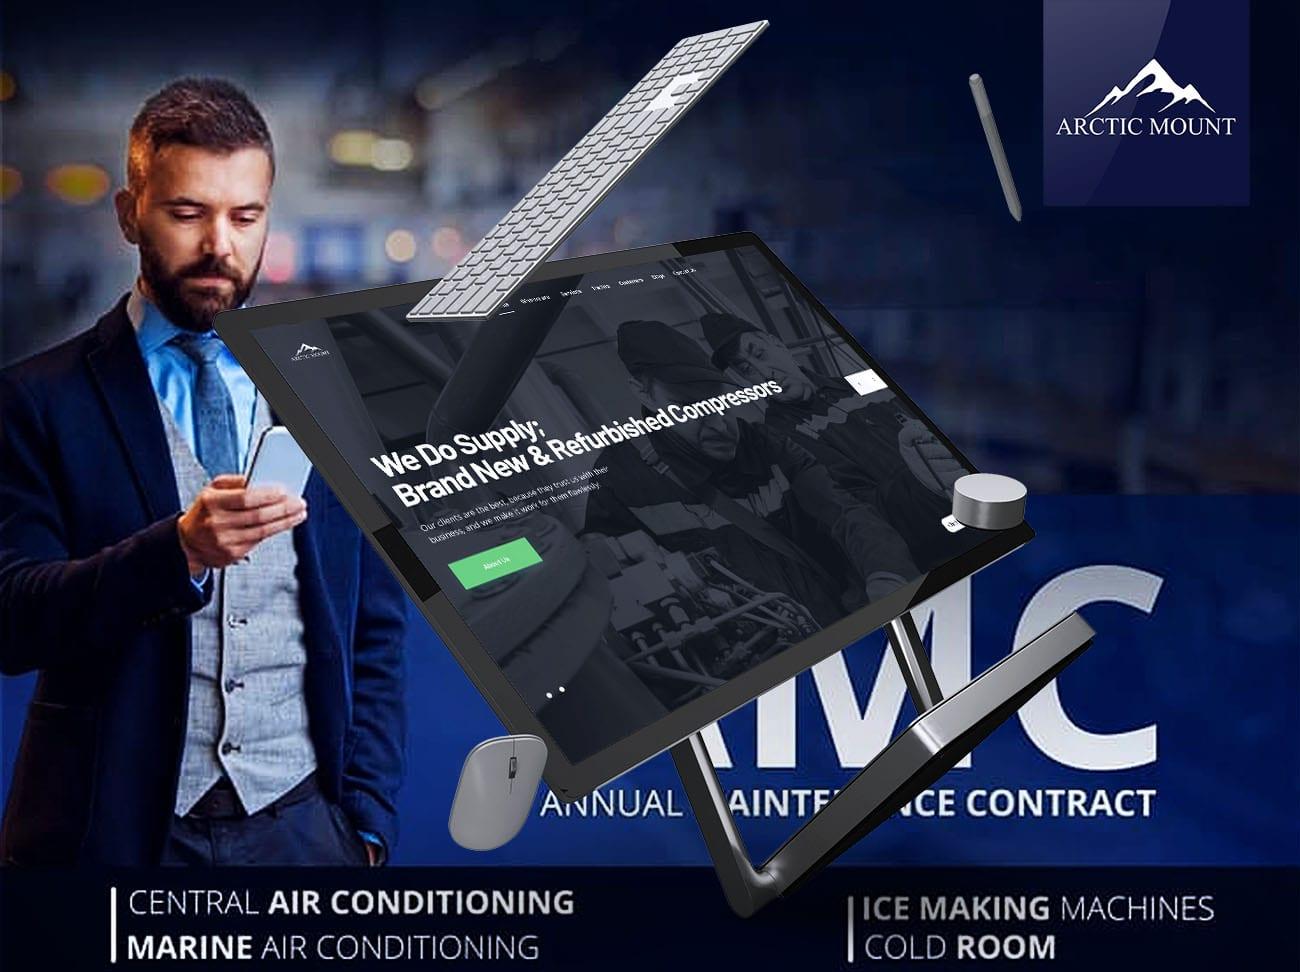 Arctic Mount - Dubai - Web Design and Digital Marketing by The Inventiv Hub